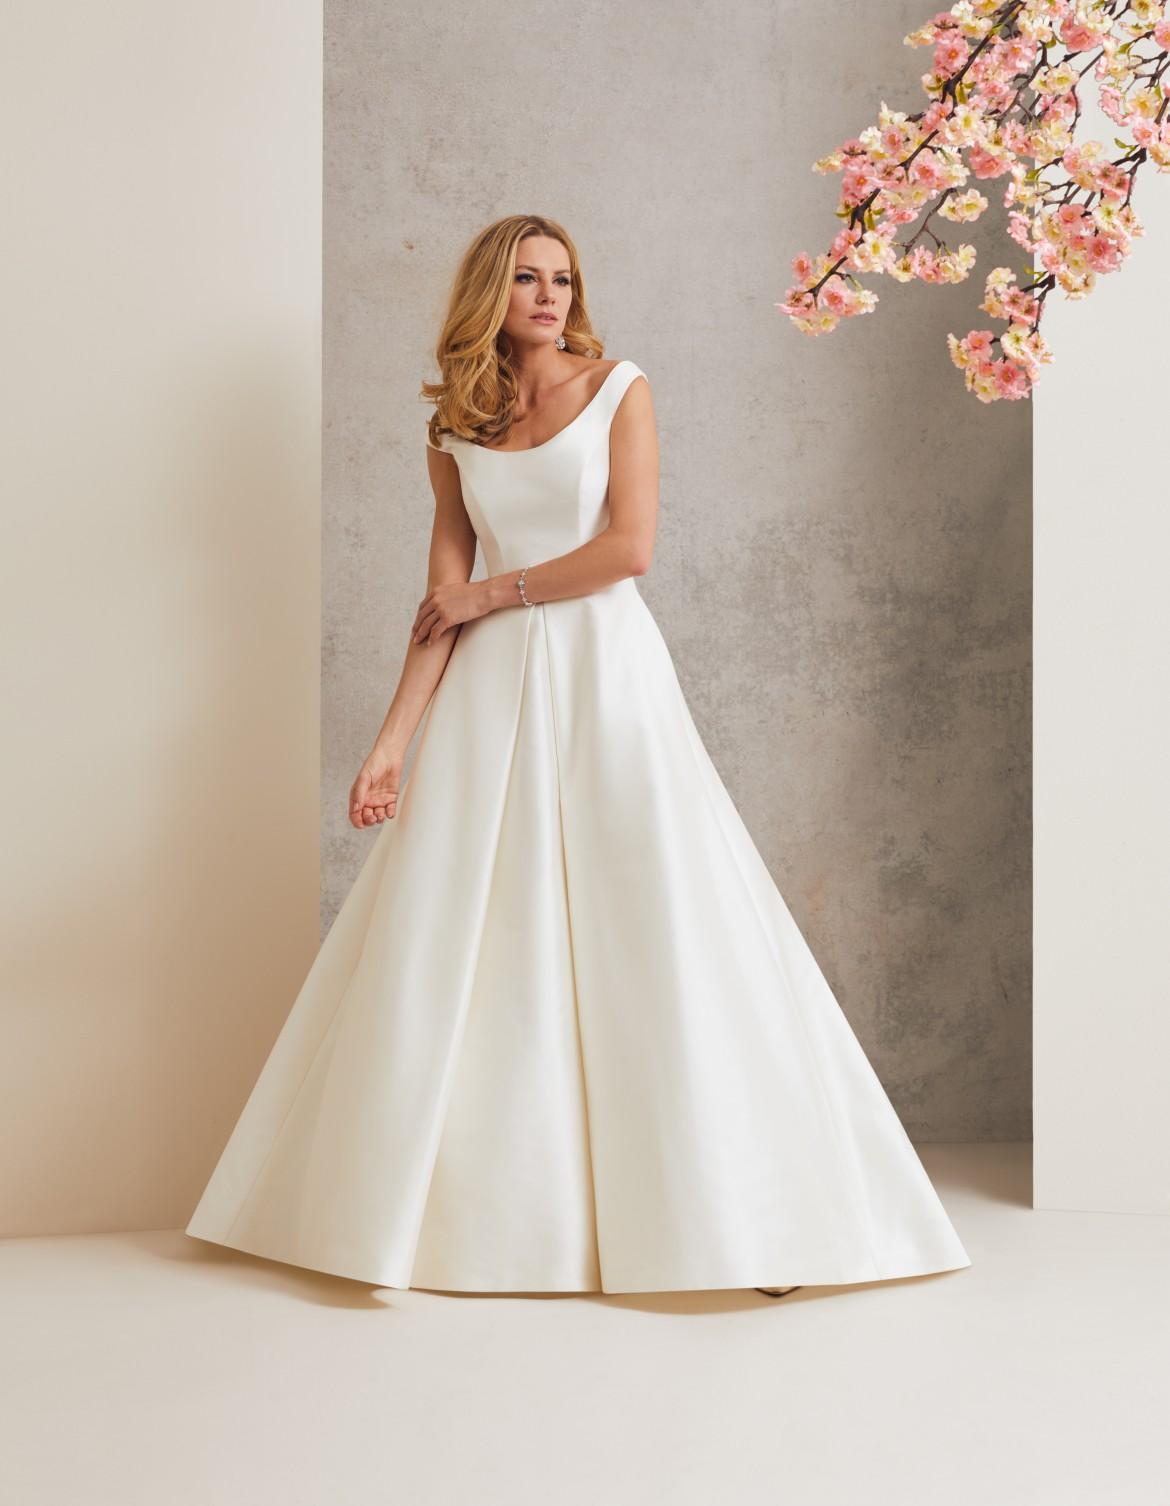 Ascot designer wedding dress by Caroline Castigliano